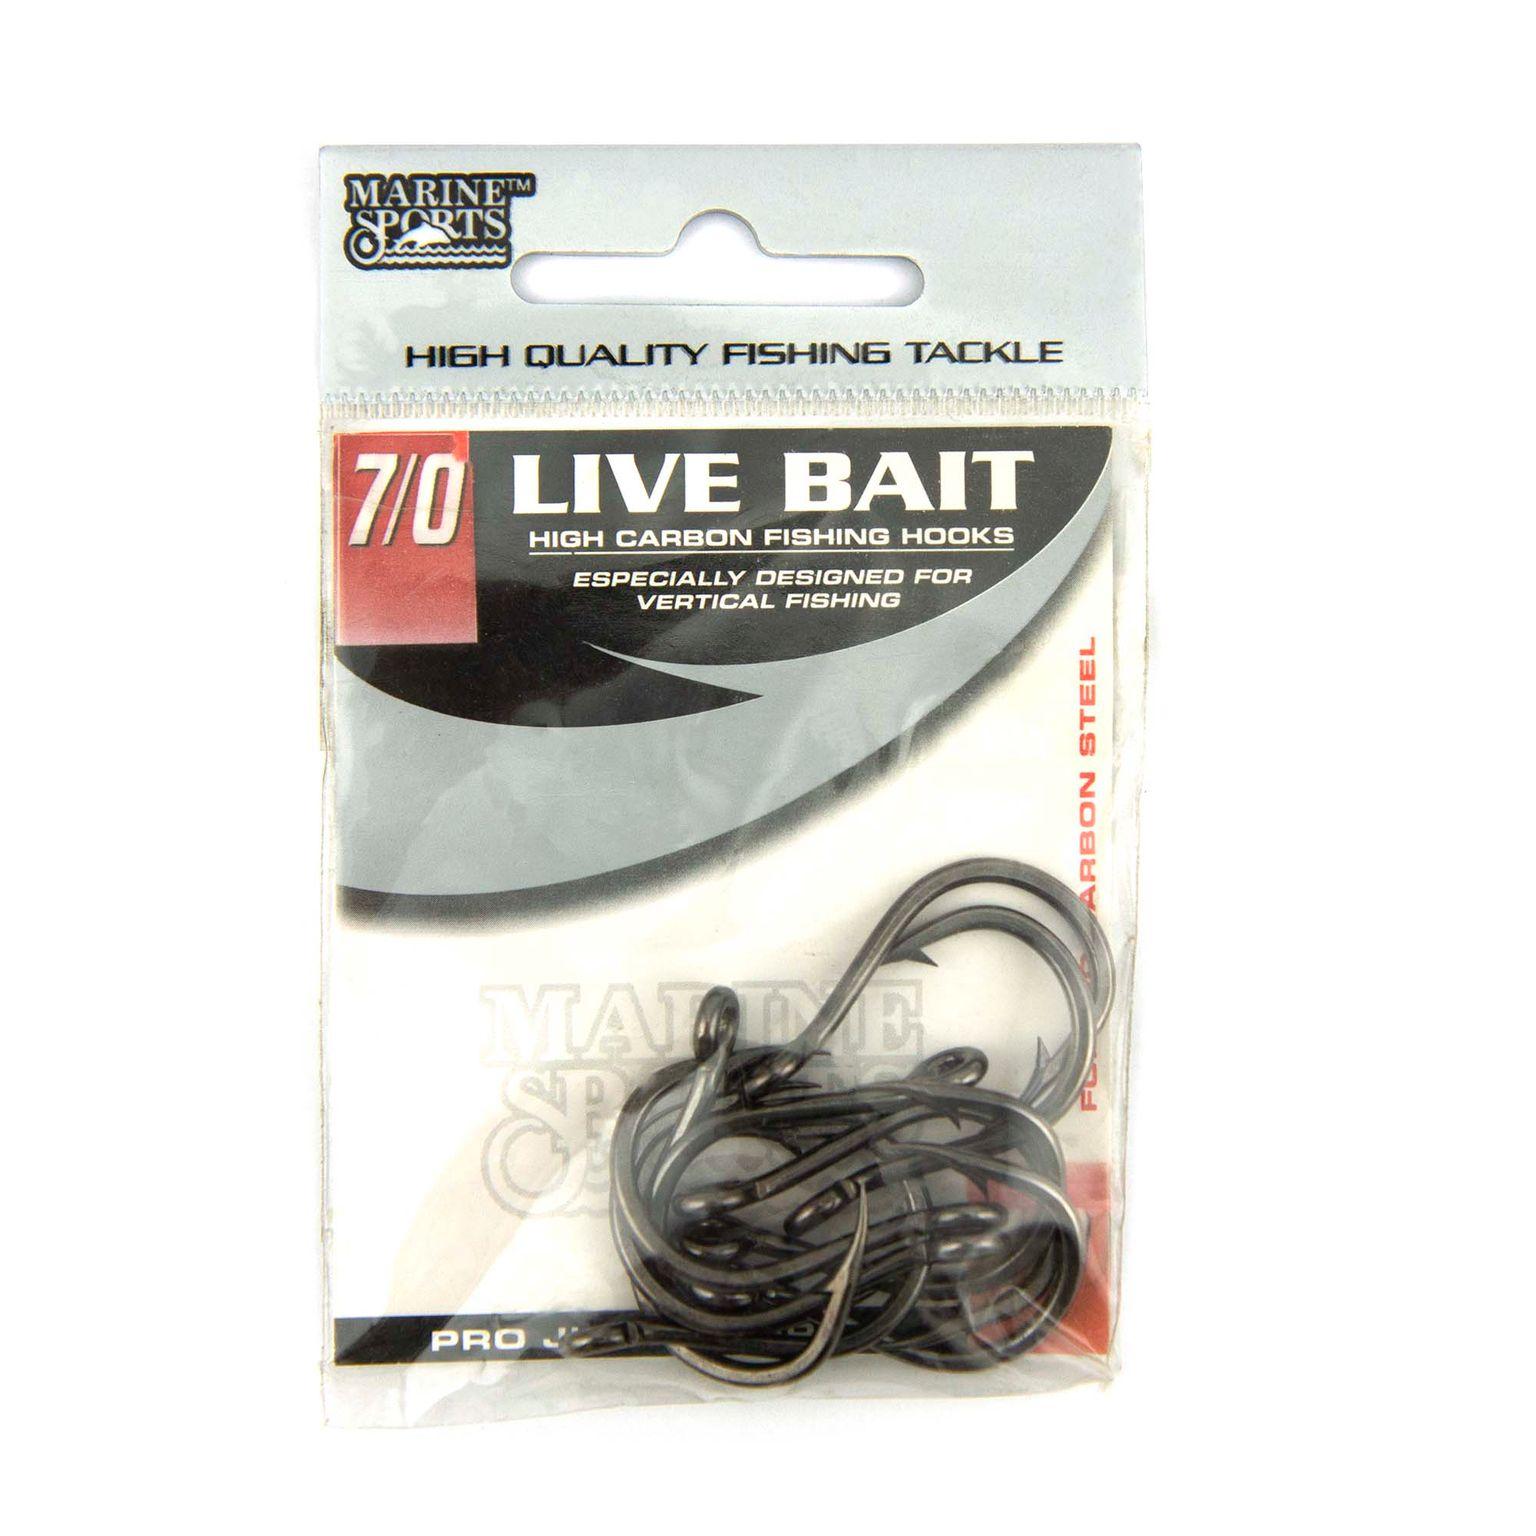 Anzol Live Bait Hook nº 7/0 - 10 unidades  - Artpesca